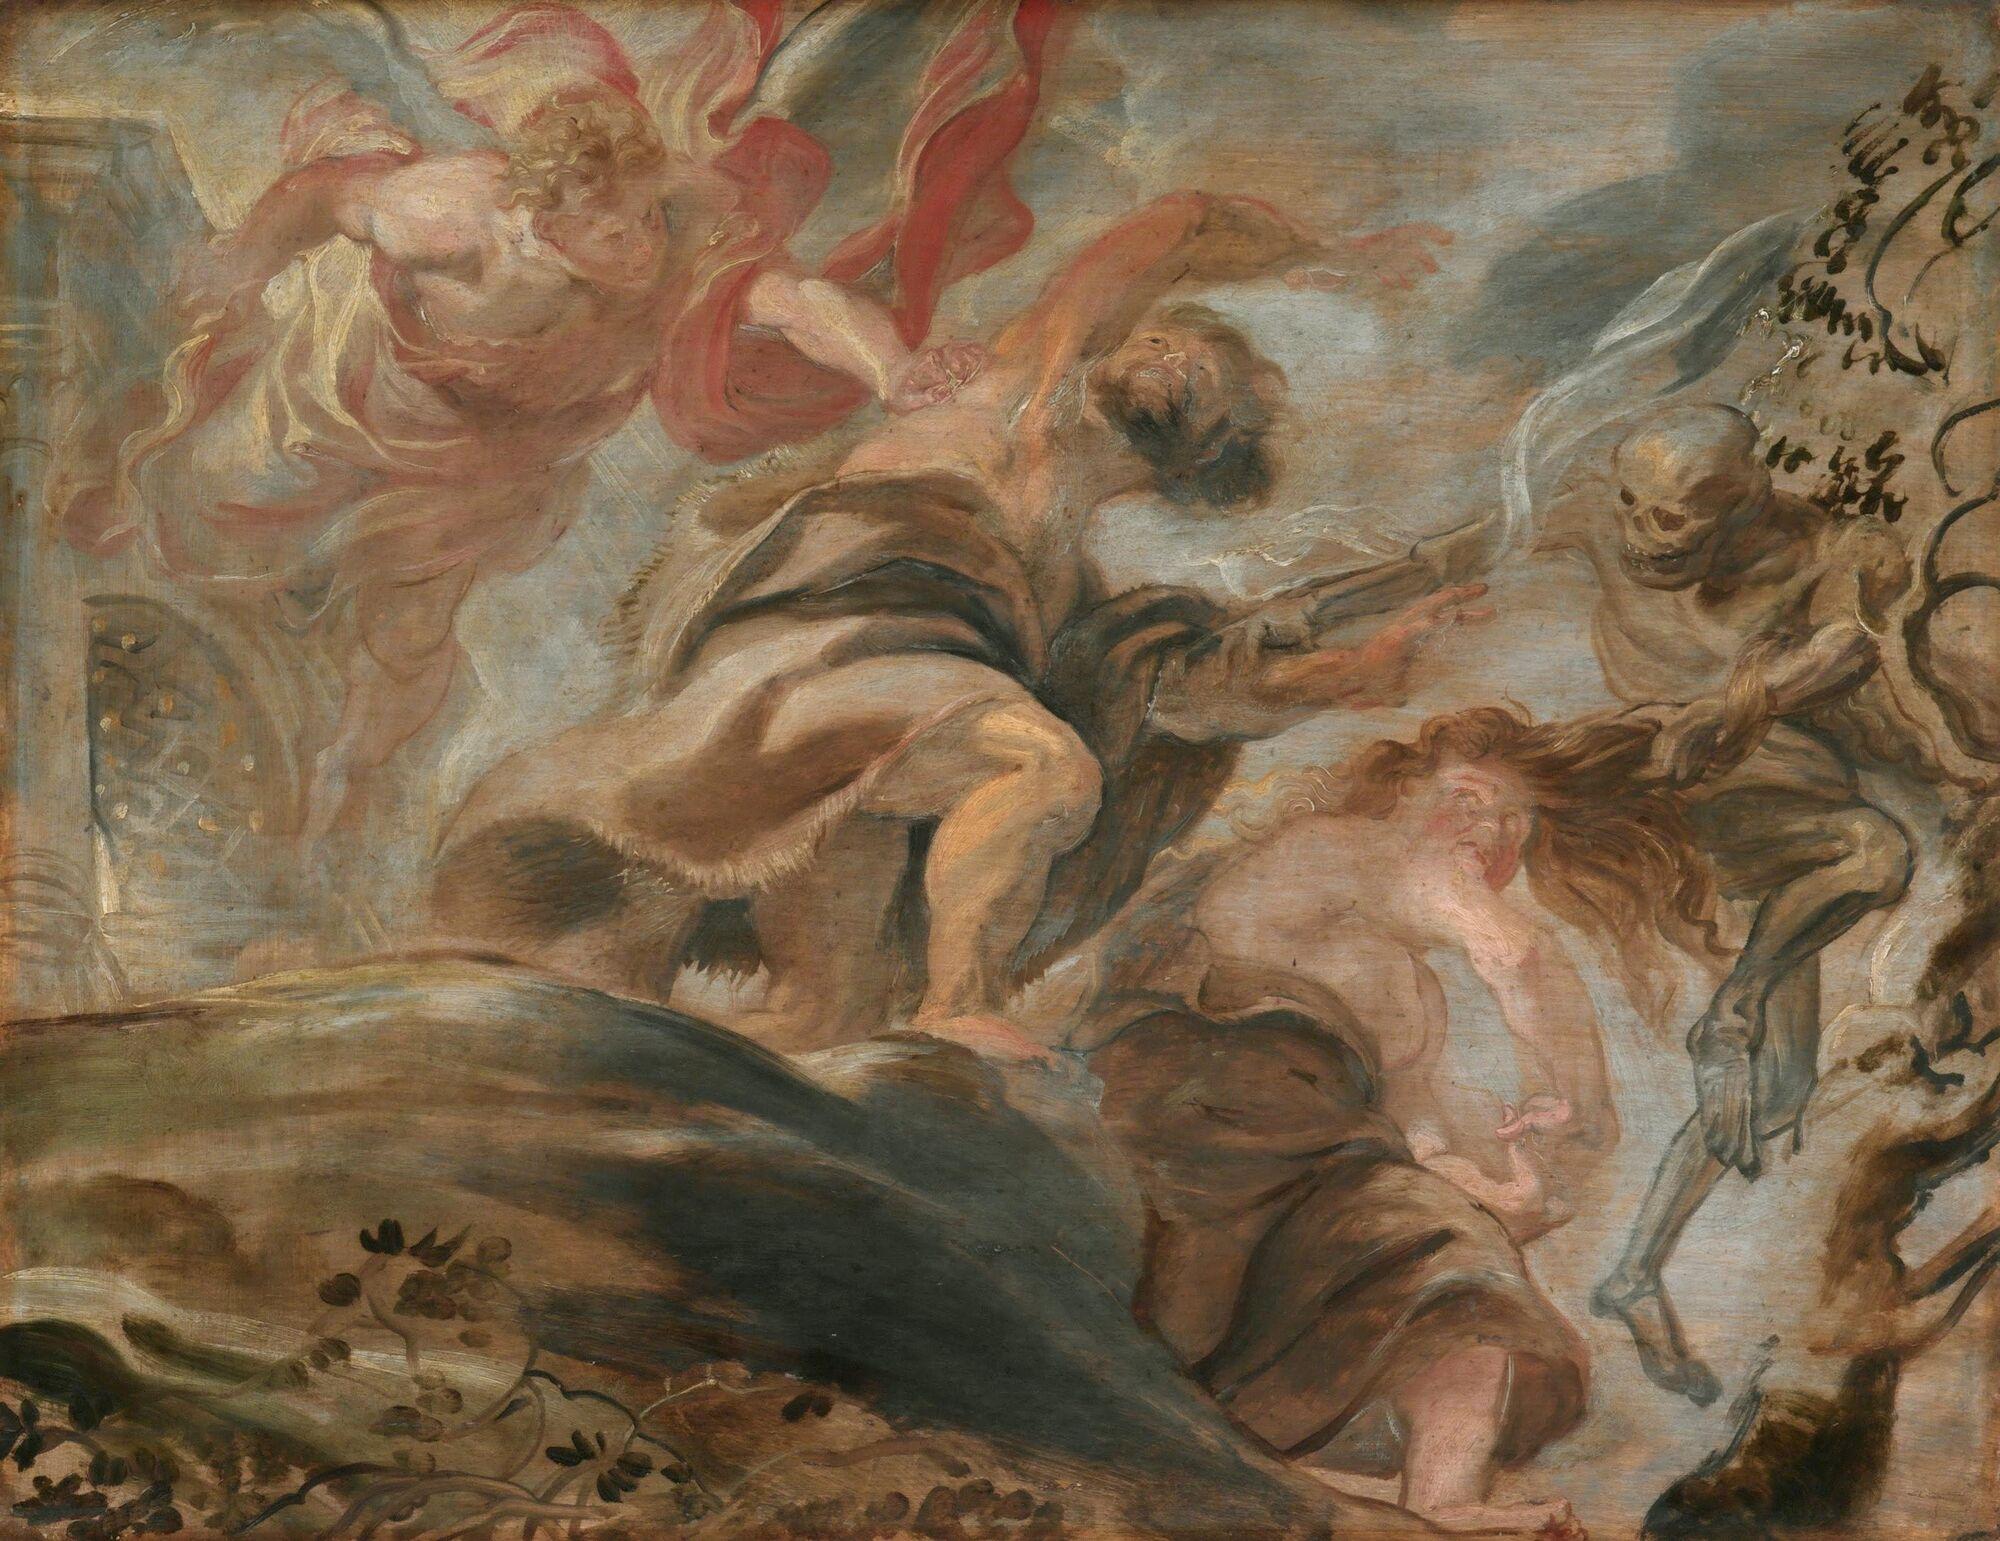 Fall of Man | The Evil Wiki | FANDOM powered by Wikia